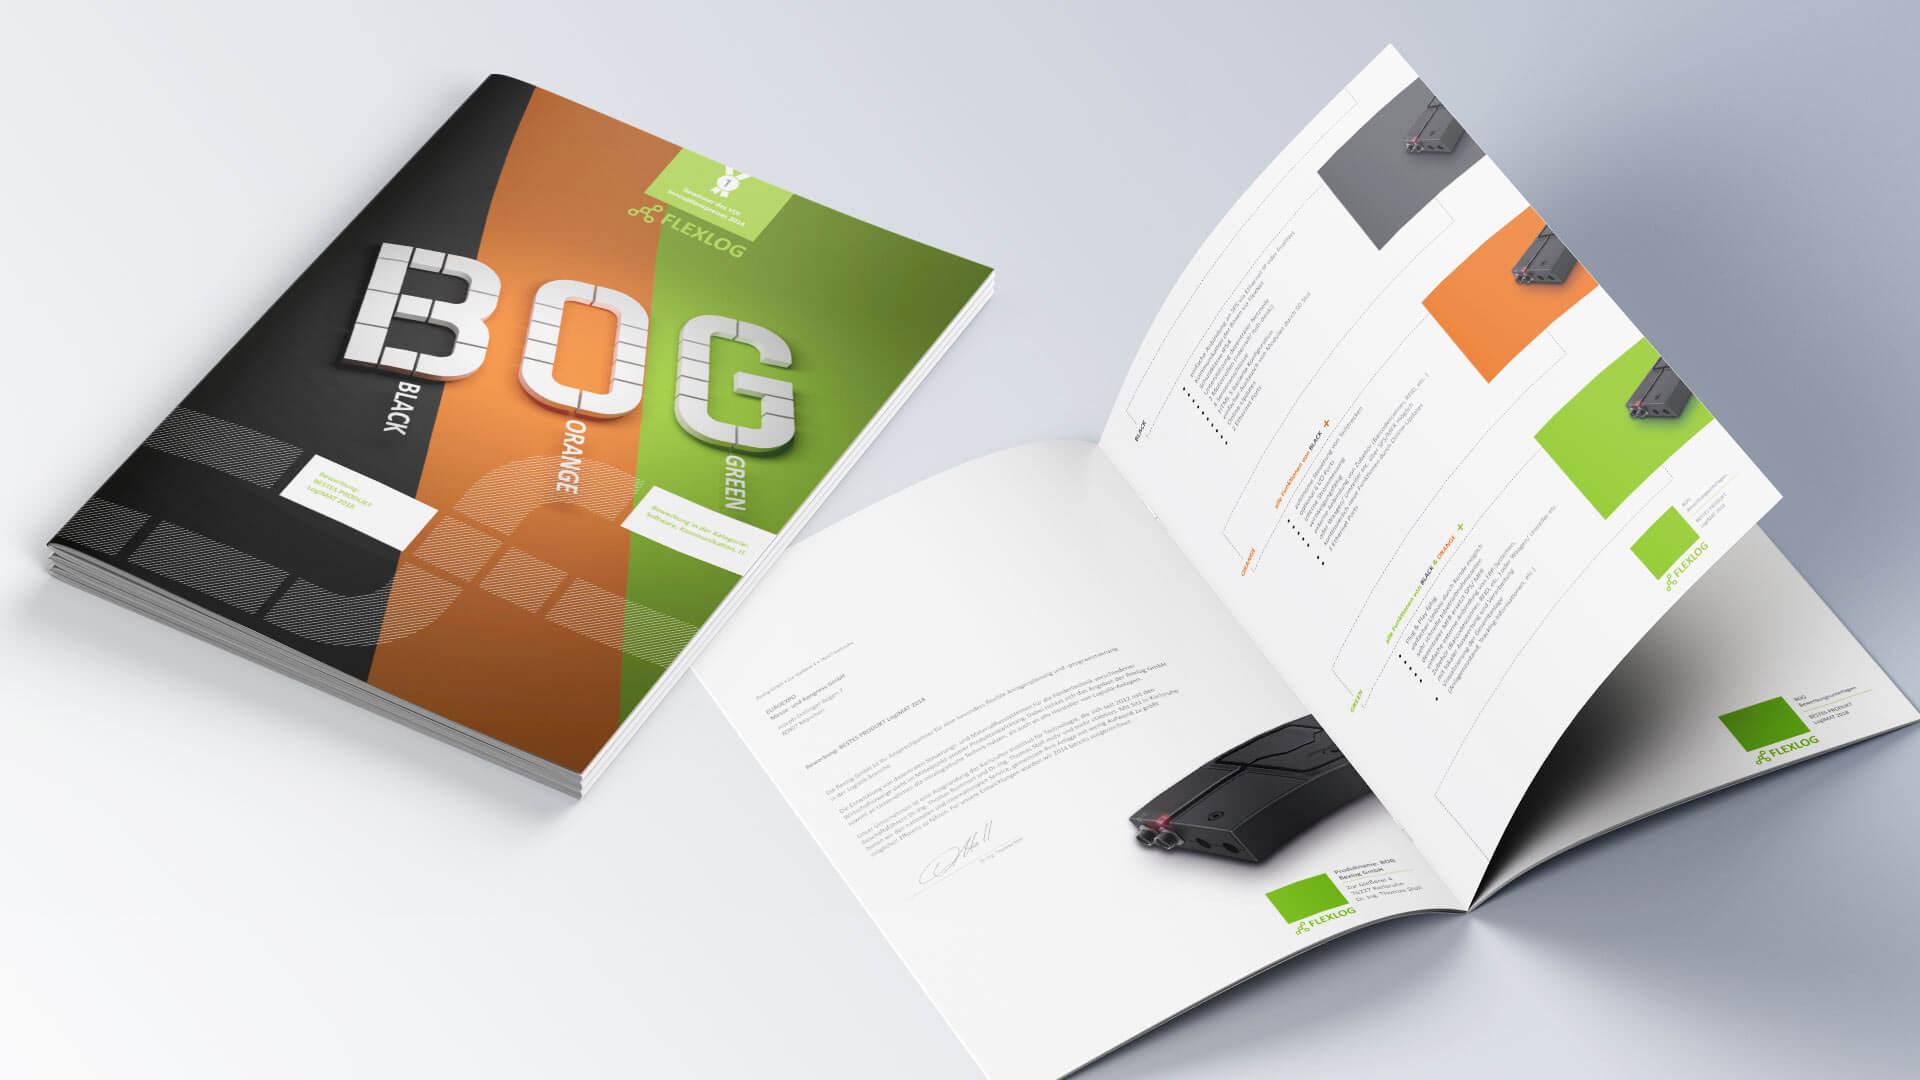 Flexlog Folder Produktfolder Broschüre